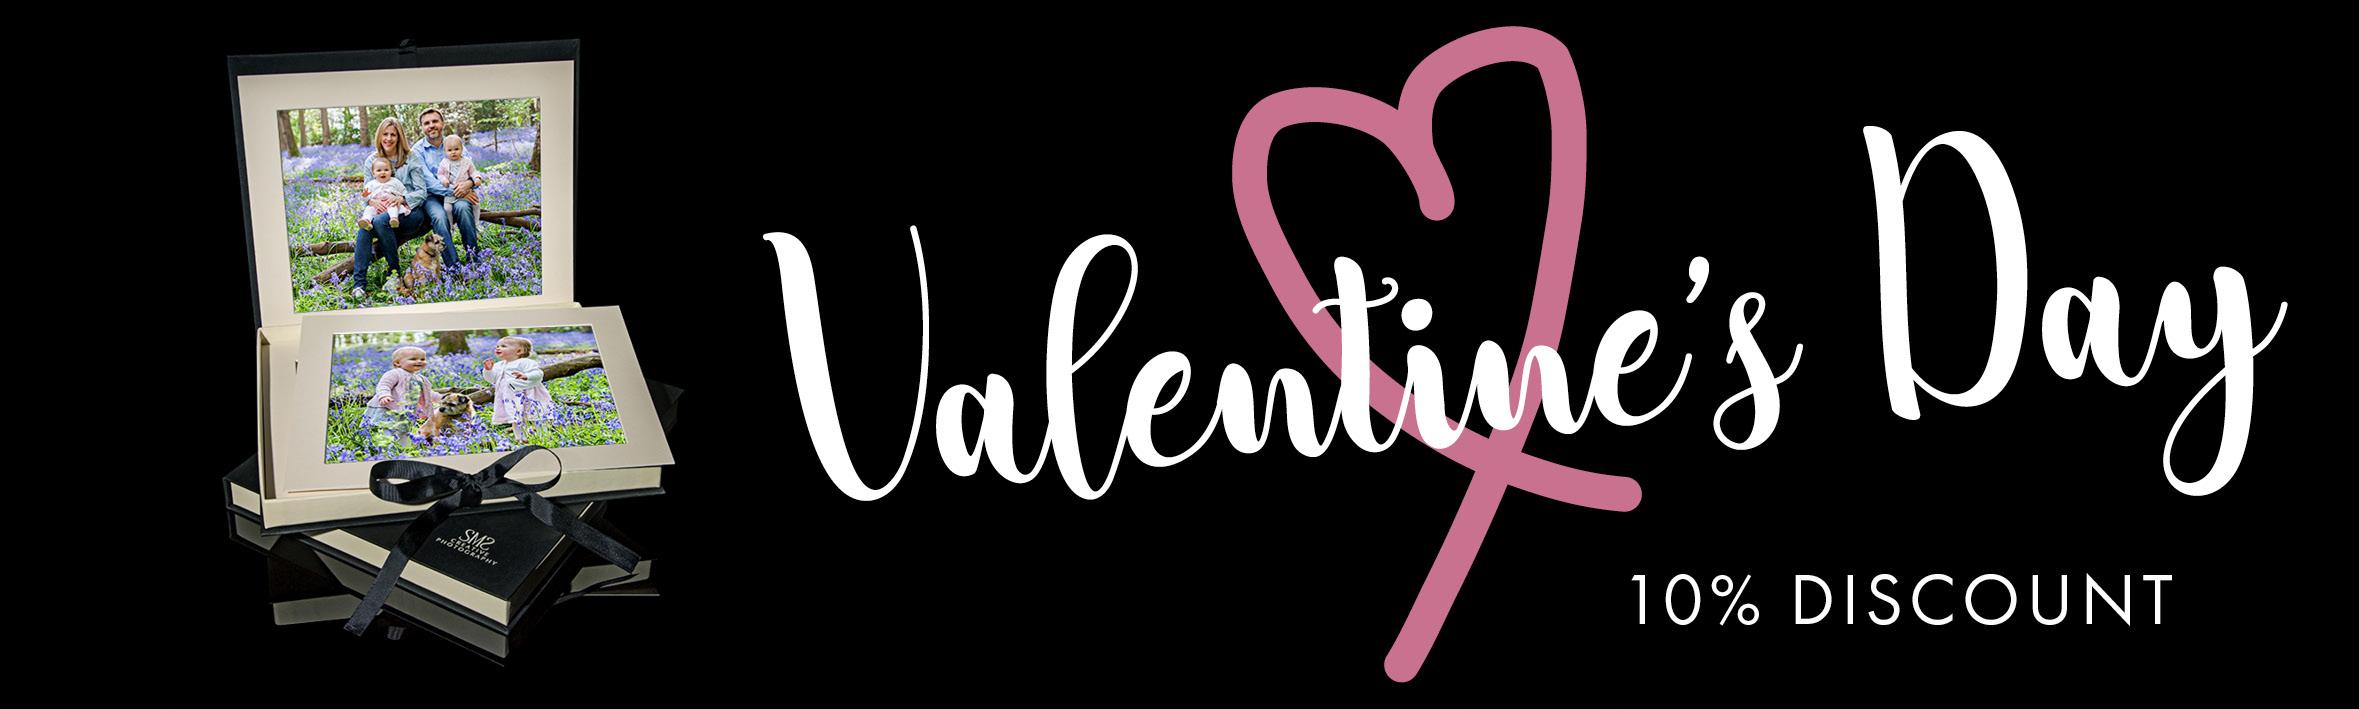 SMS Valentines Day Offer.jpg